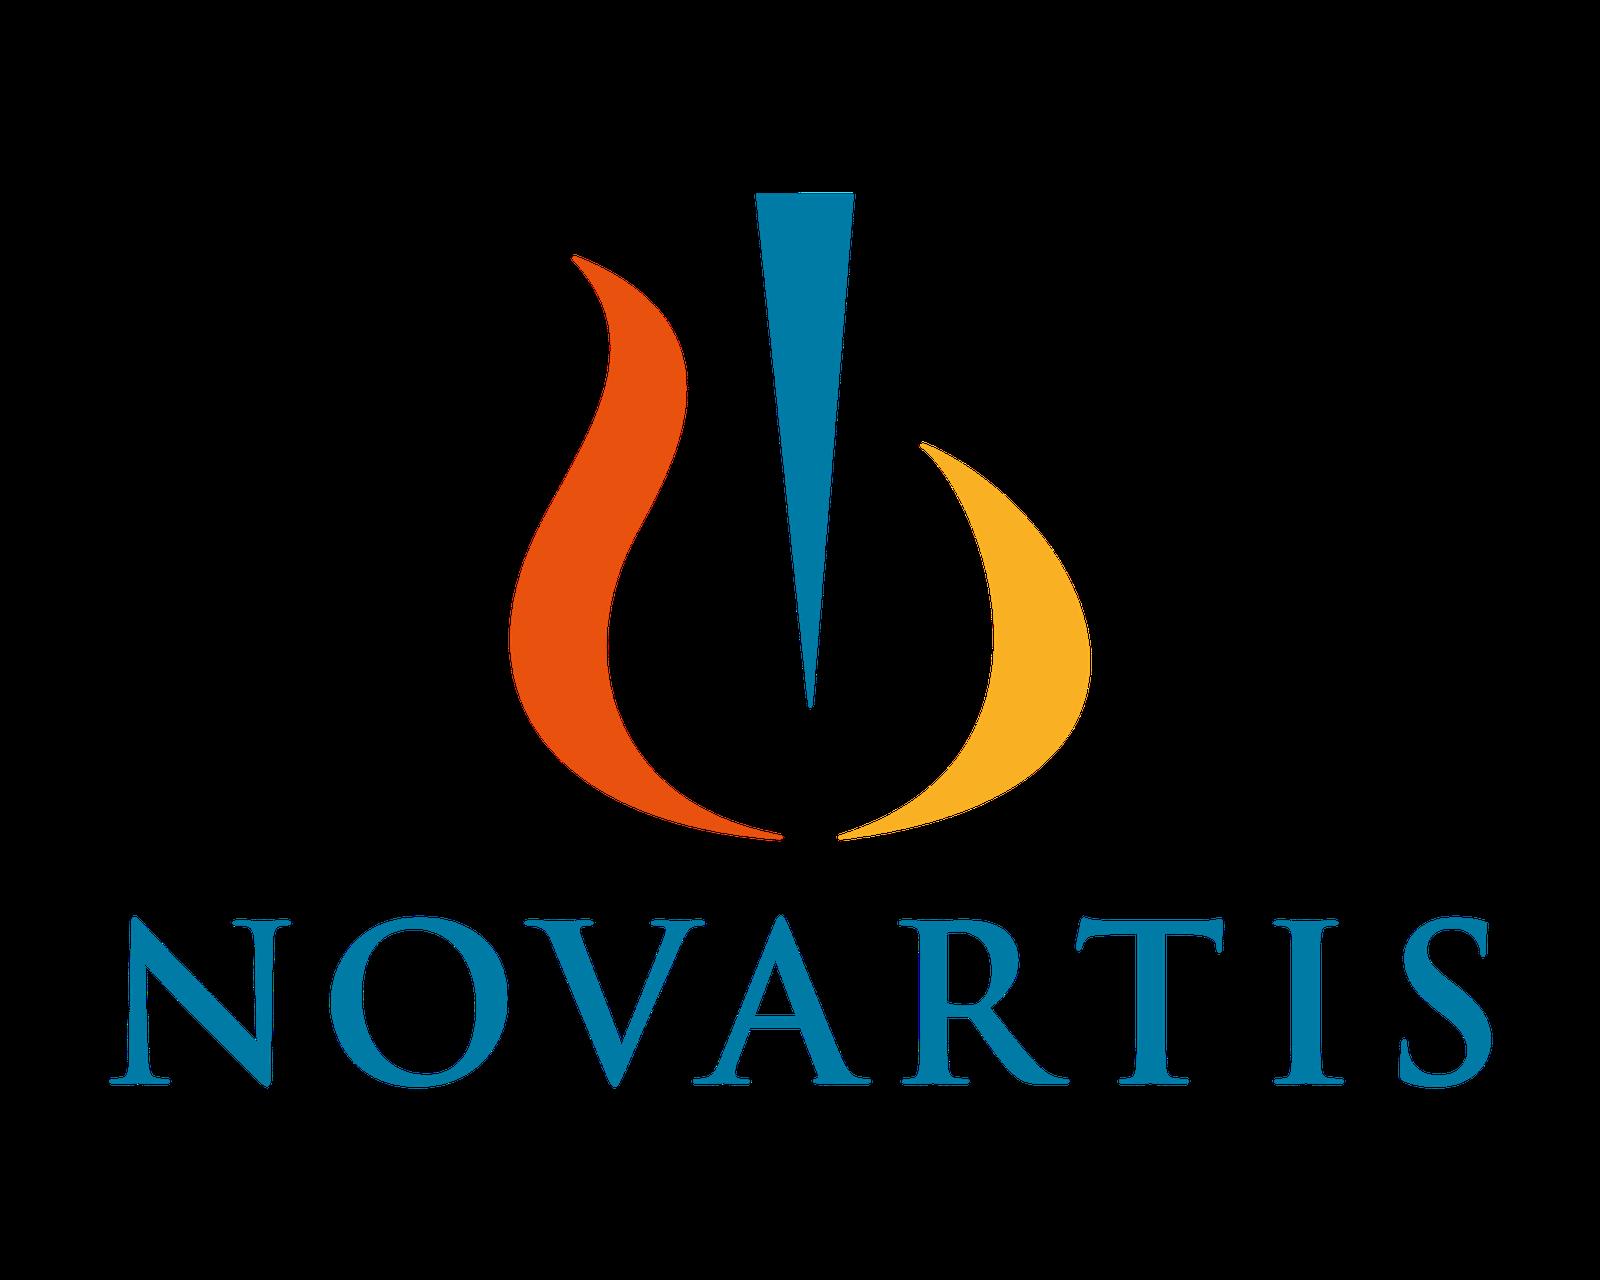 88b20a1b46fa2a9e6415_Logo_Novartis.jpg